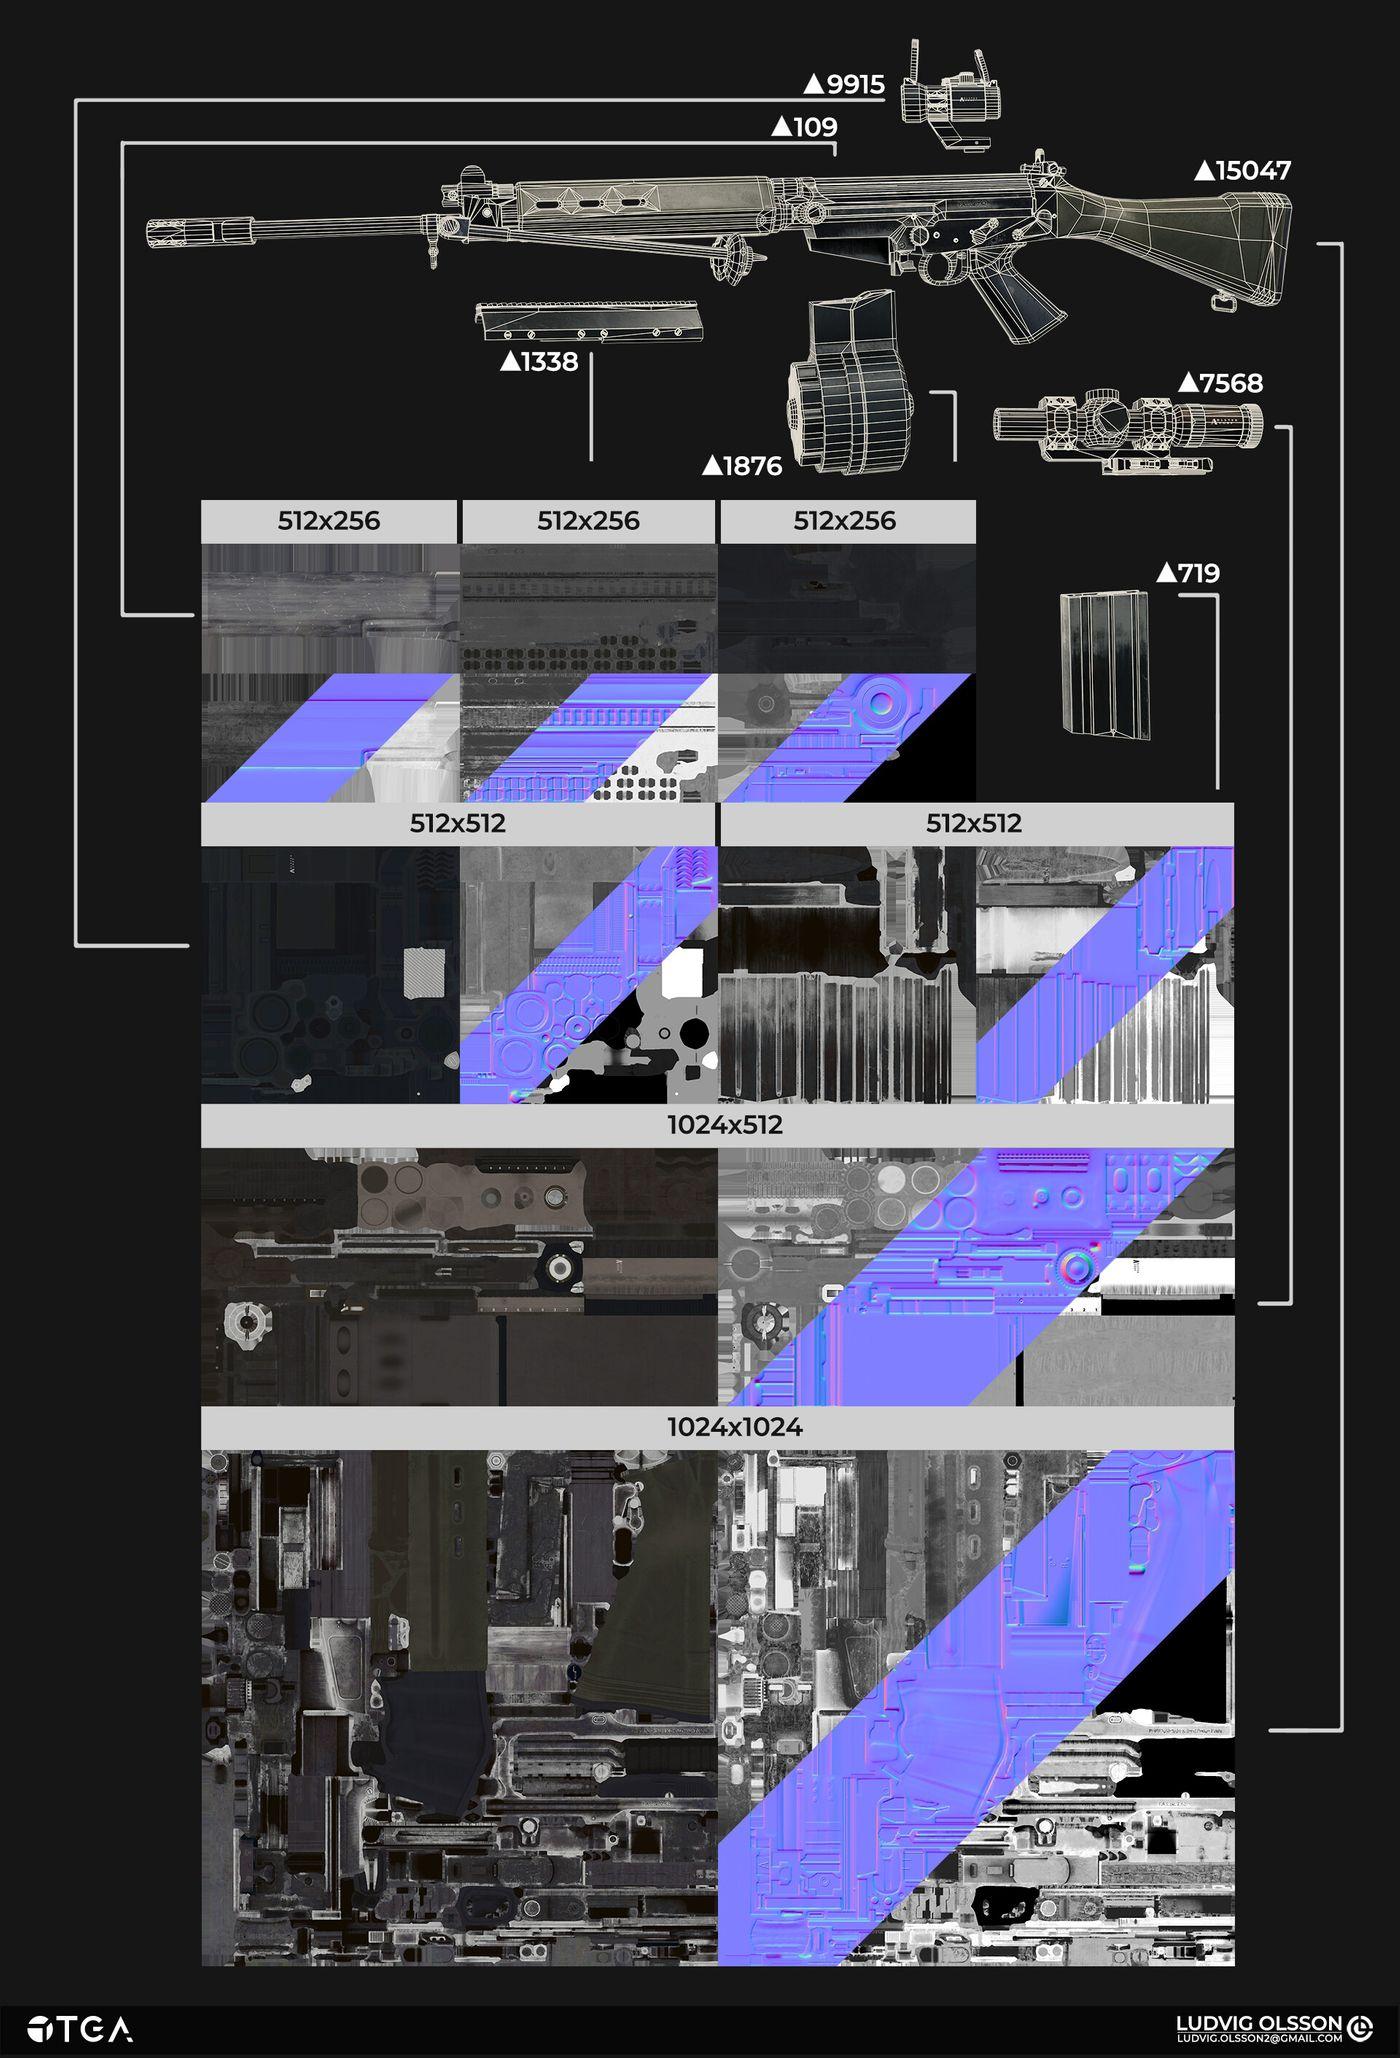 Https: F; F;d3stdg5so273ei.cloudfront.net F;luddemech F;2019 05 07 F;909214 F;1400x Auto F;ludvig Olsson Ludvig Olsson Info Luddemech